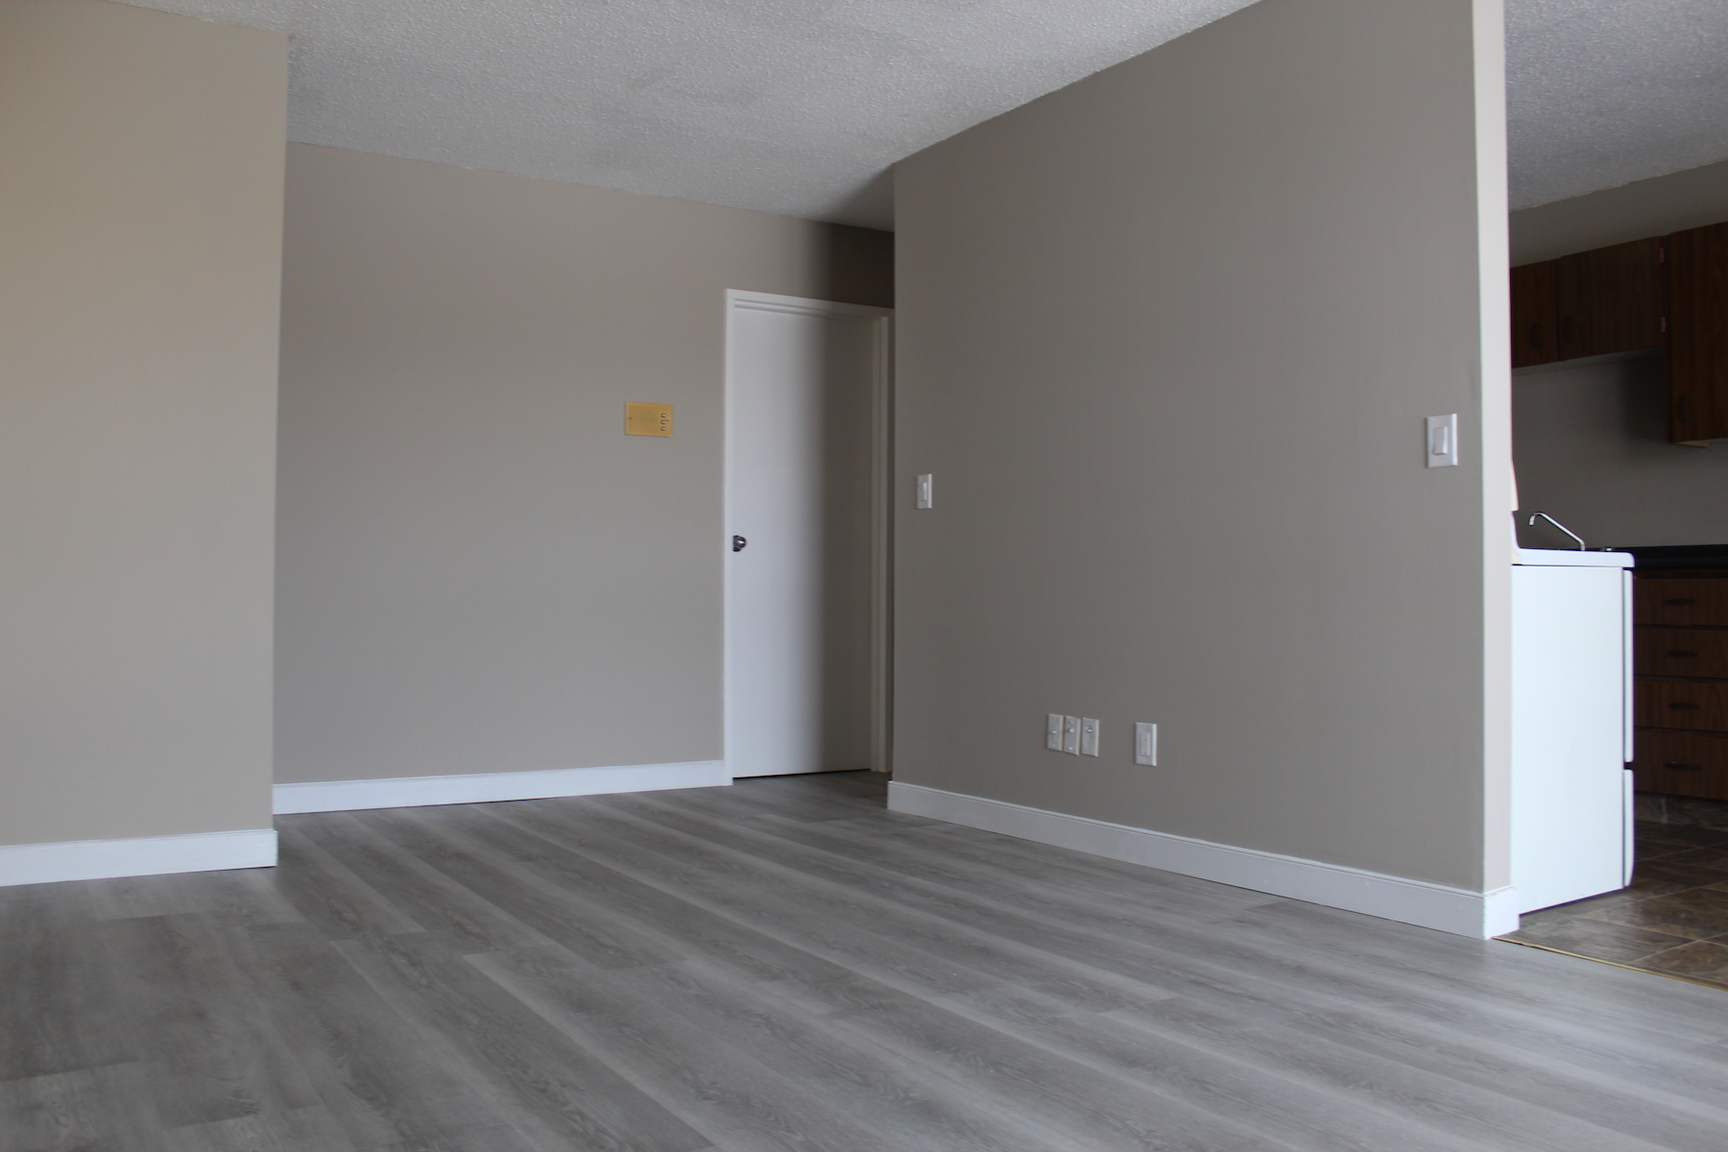 3 Kleisinger Crescent, Regina, SK - $964